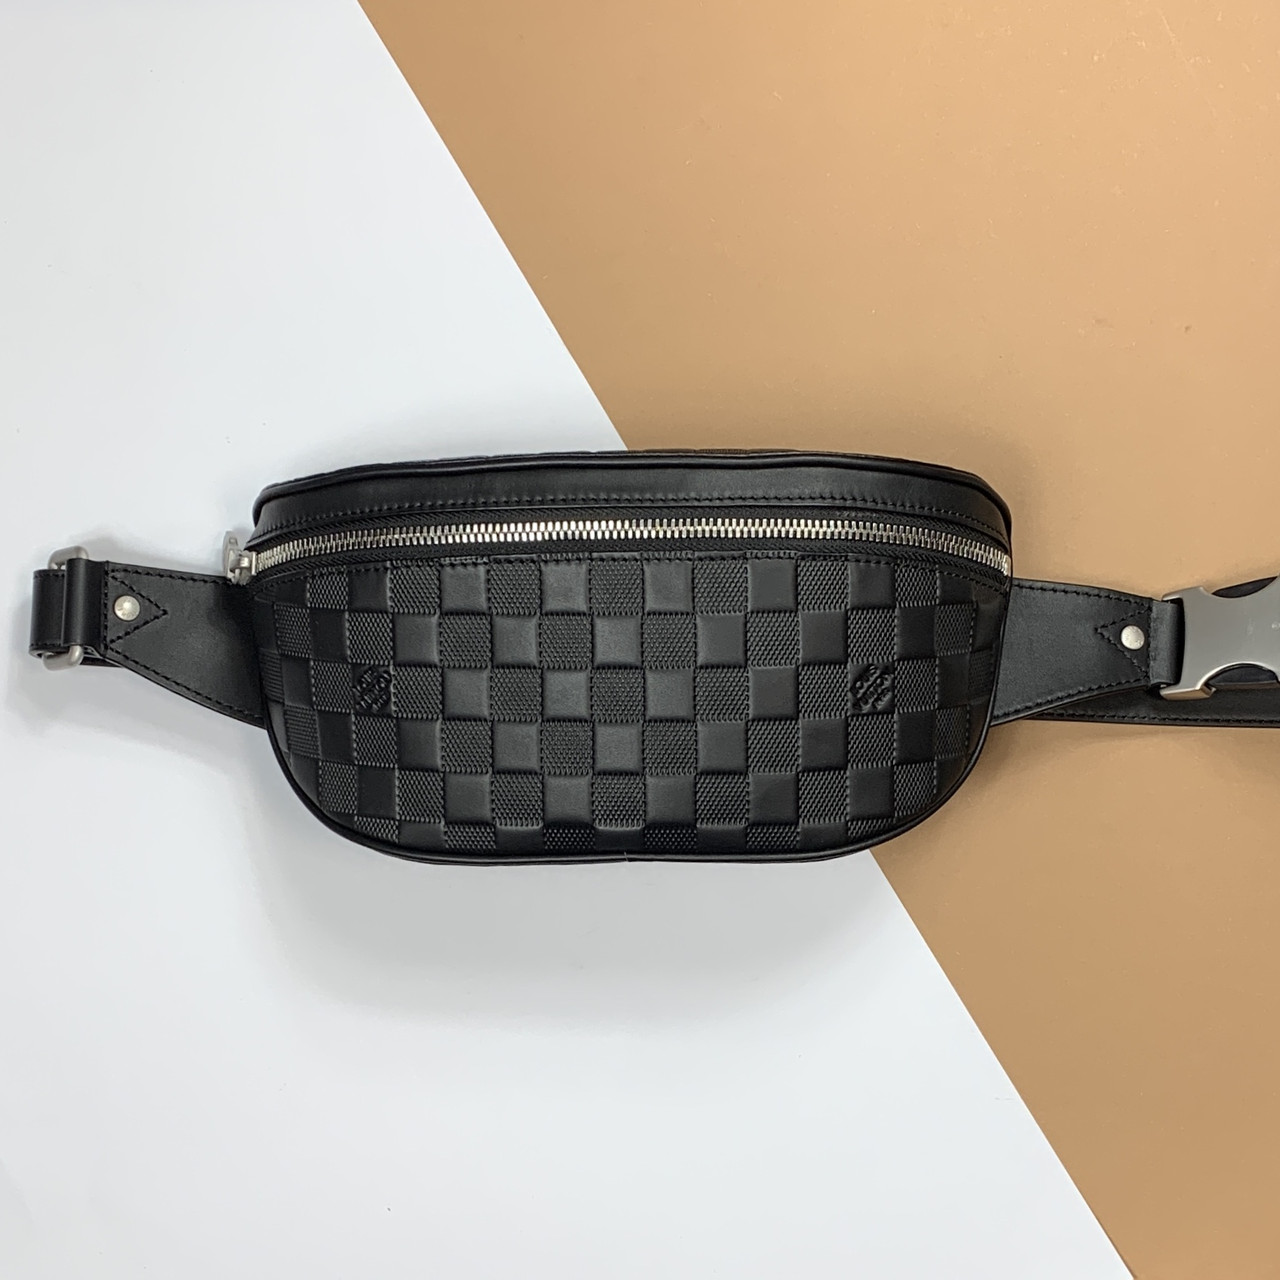 Поясная сумка Louis Vuitton CAMPUS (Луи Виттон Кампус) арт. 14-236